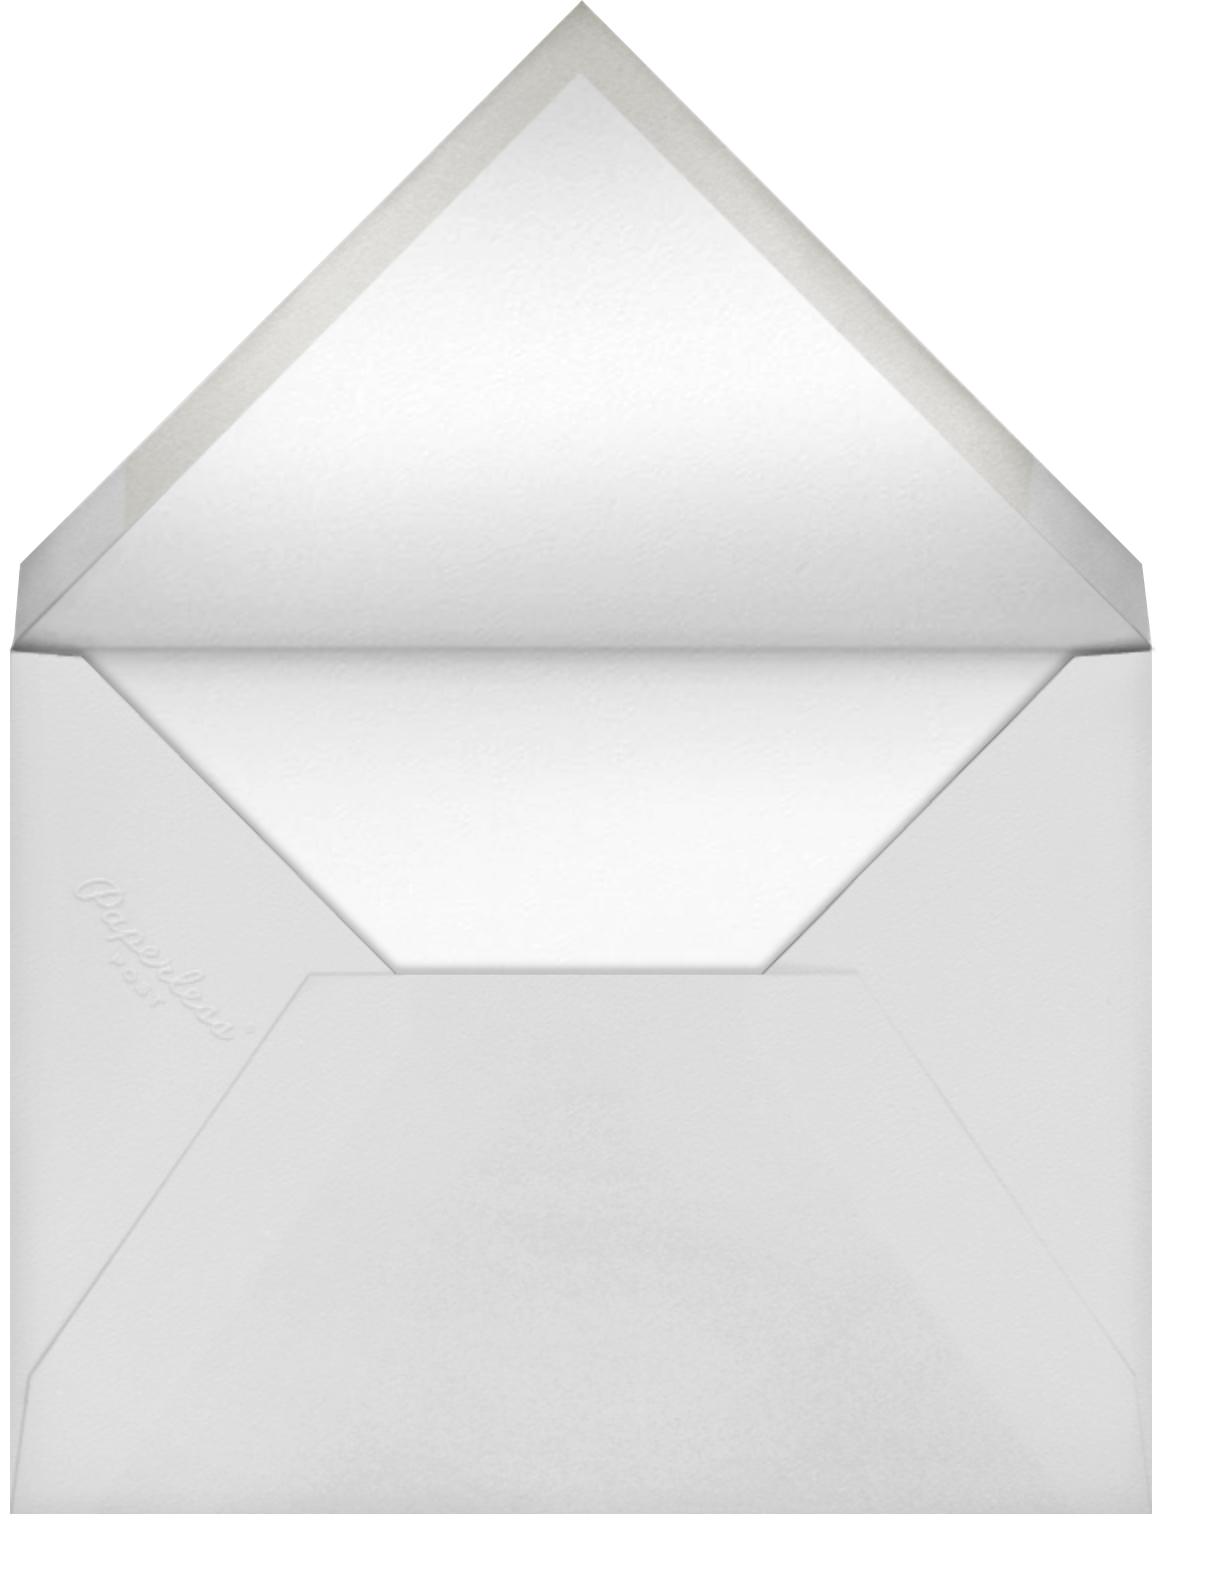 Optical City - Navy - Paperless Post - null - envelope back